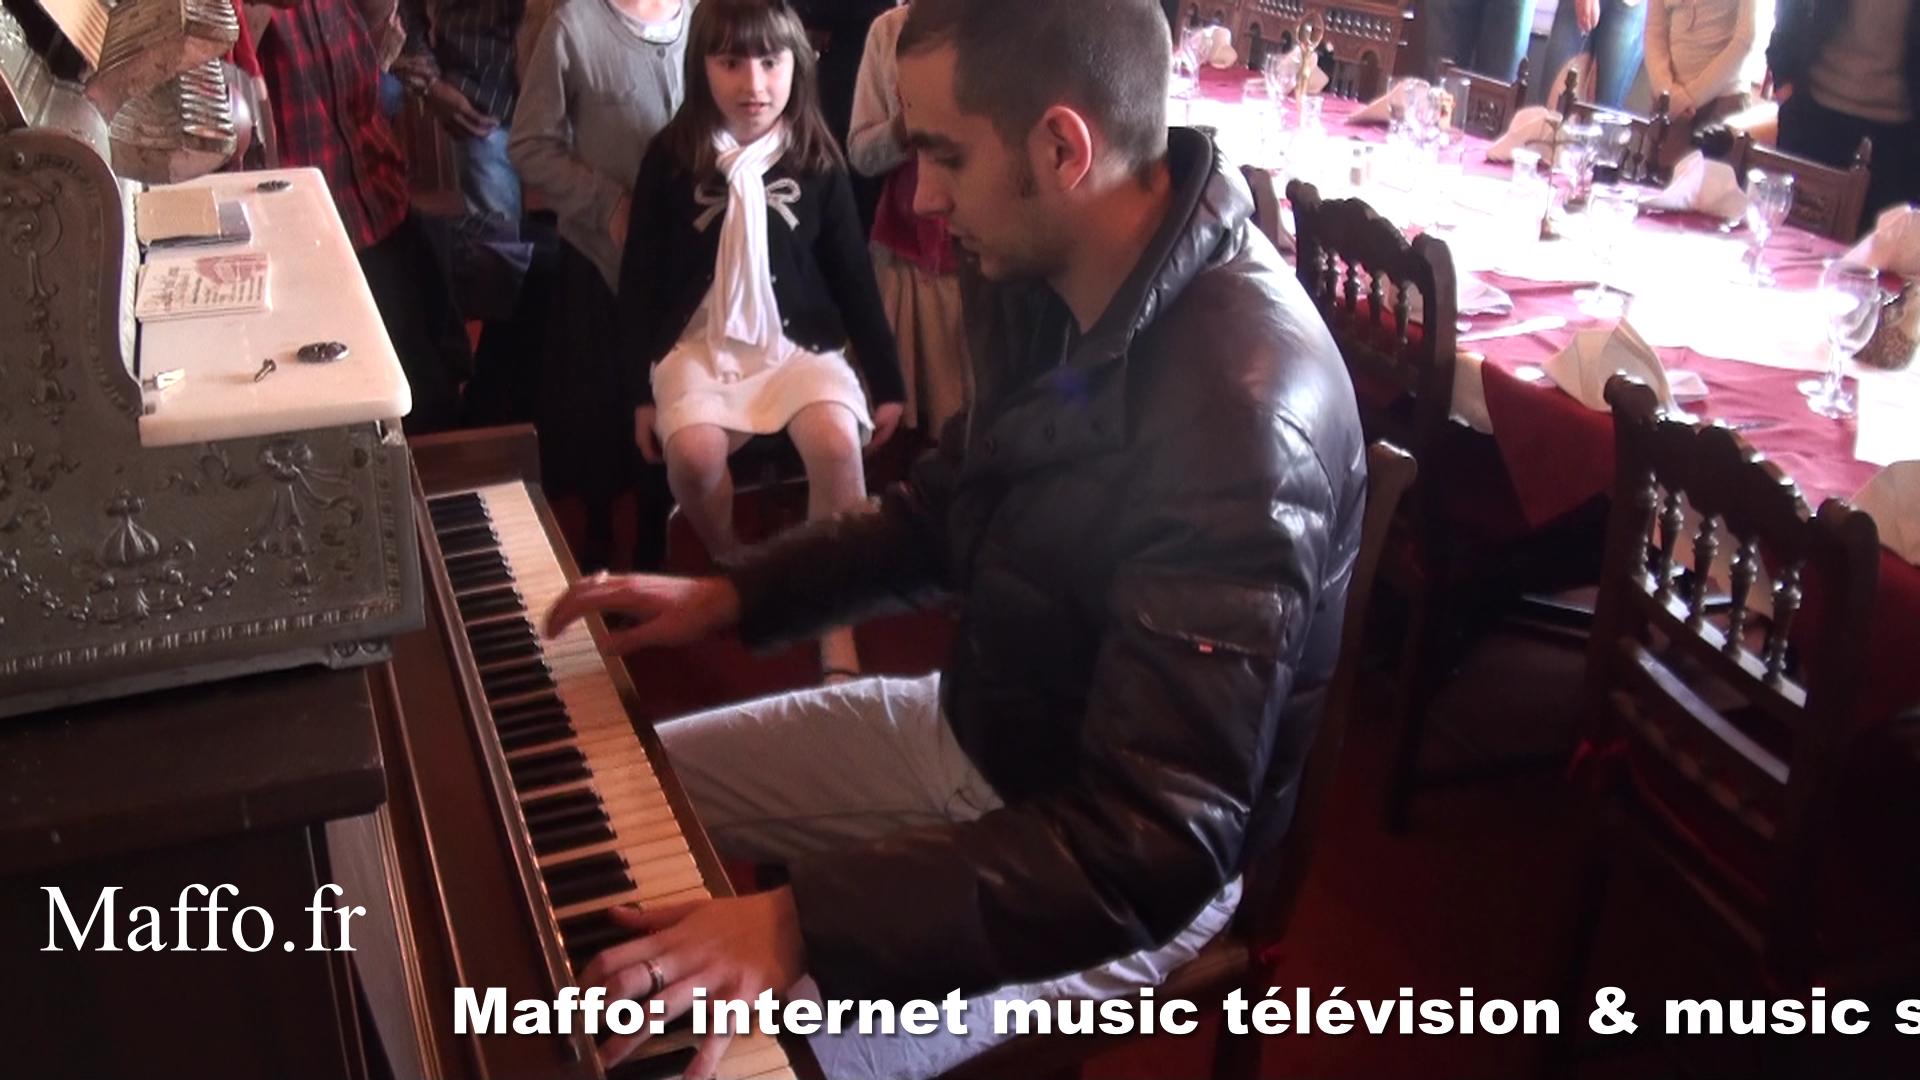 Ray charles Piano, Concert Nadine N°10 By Maffo Fr